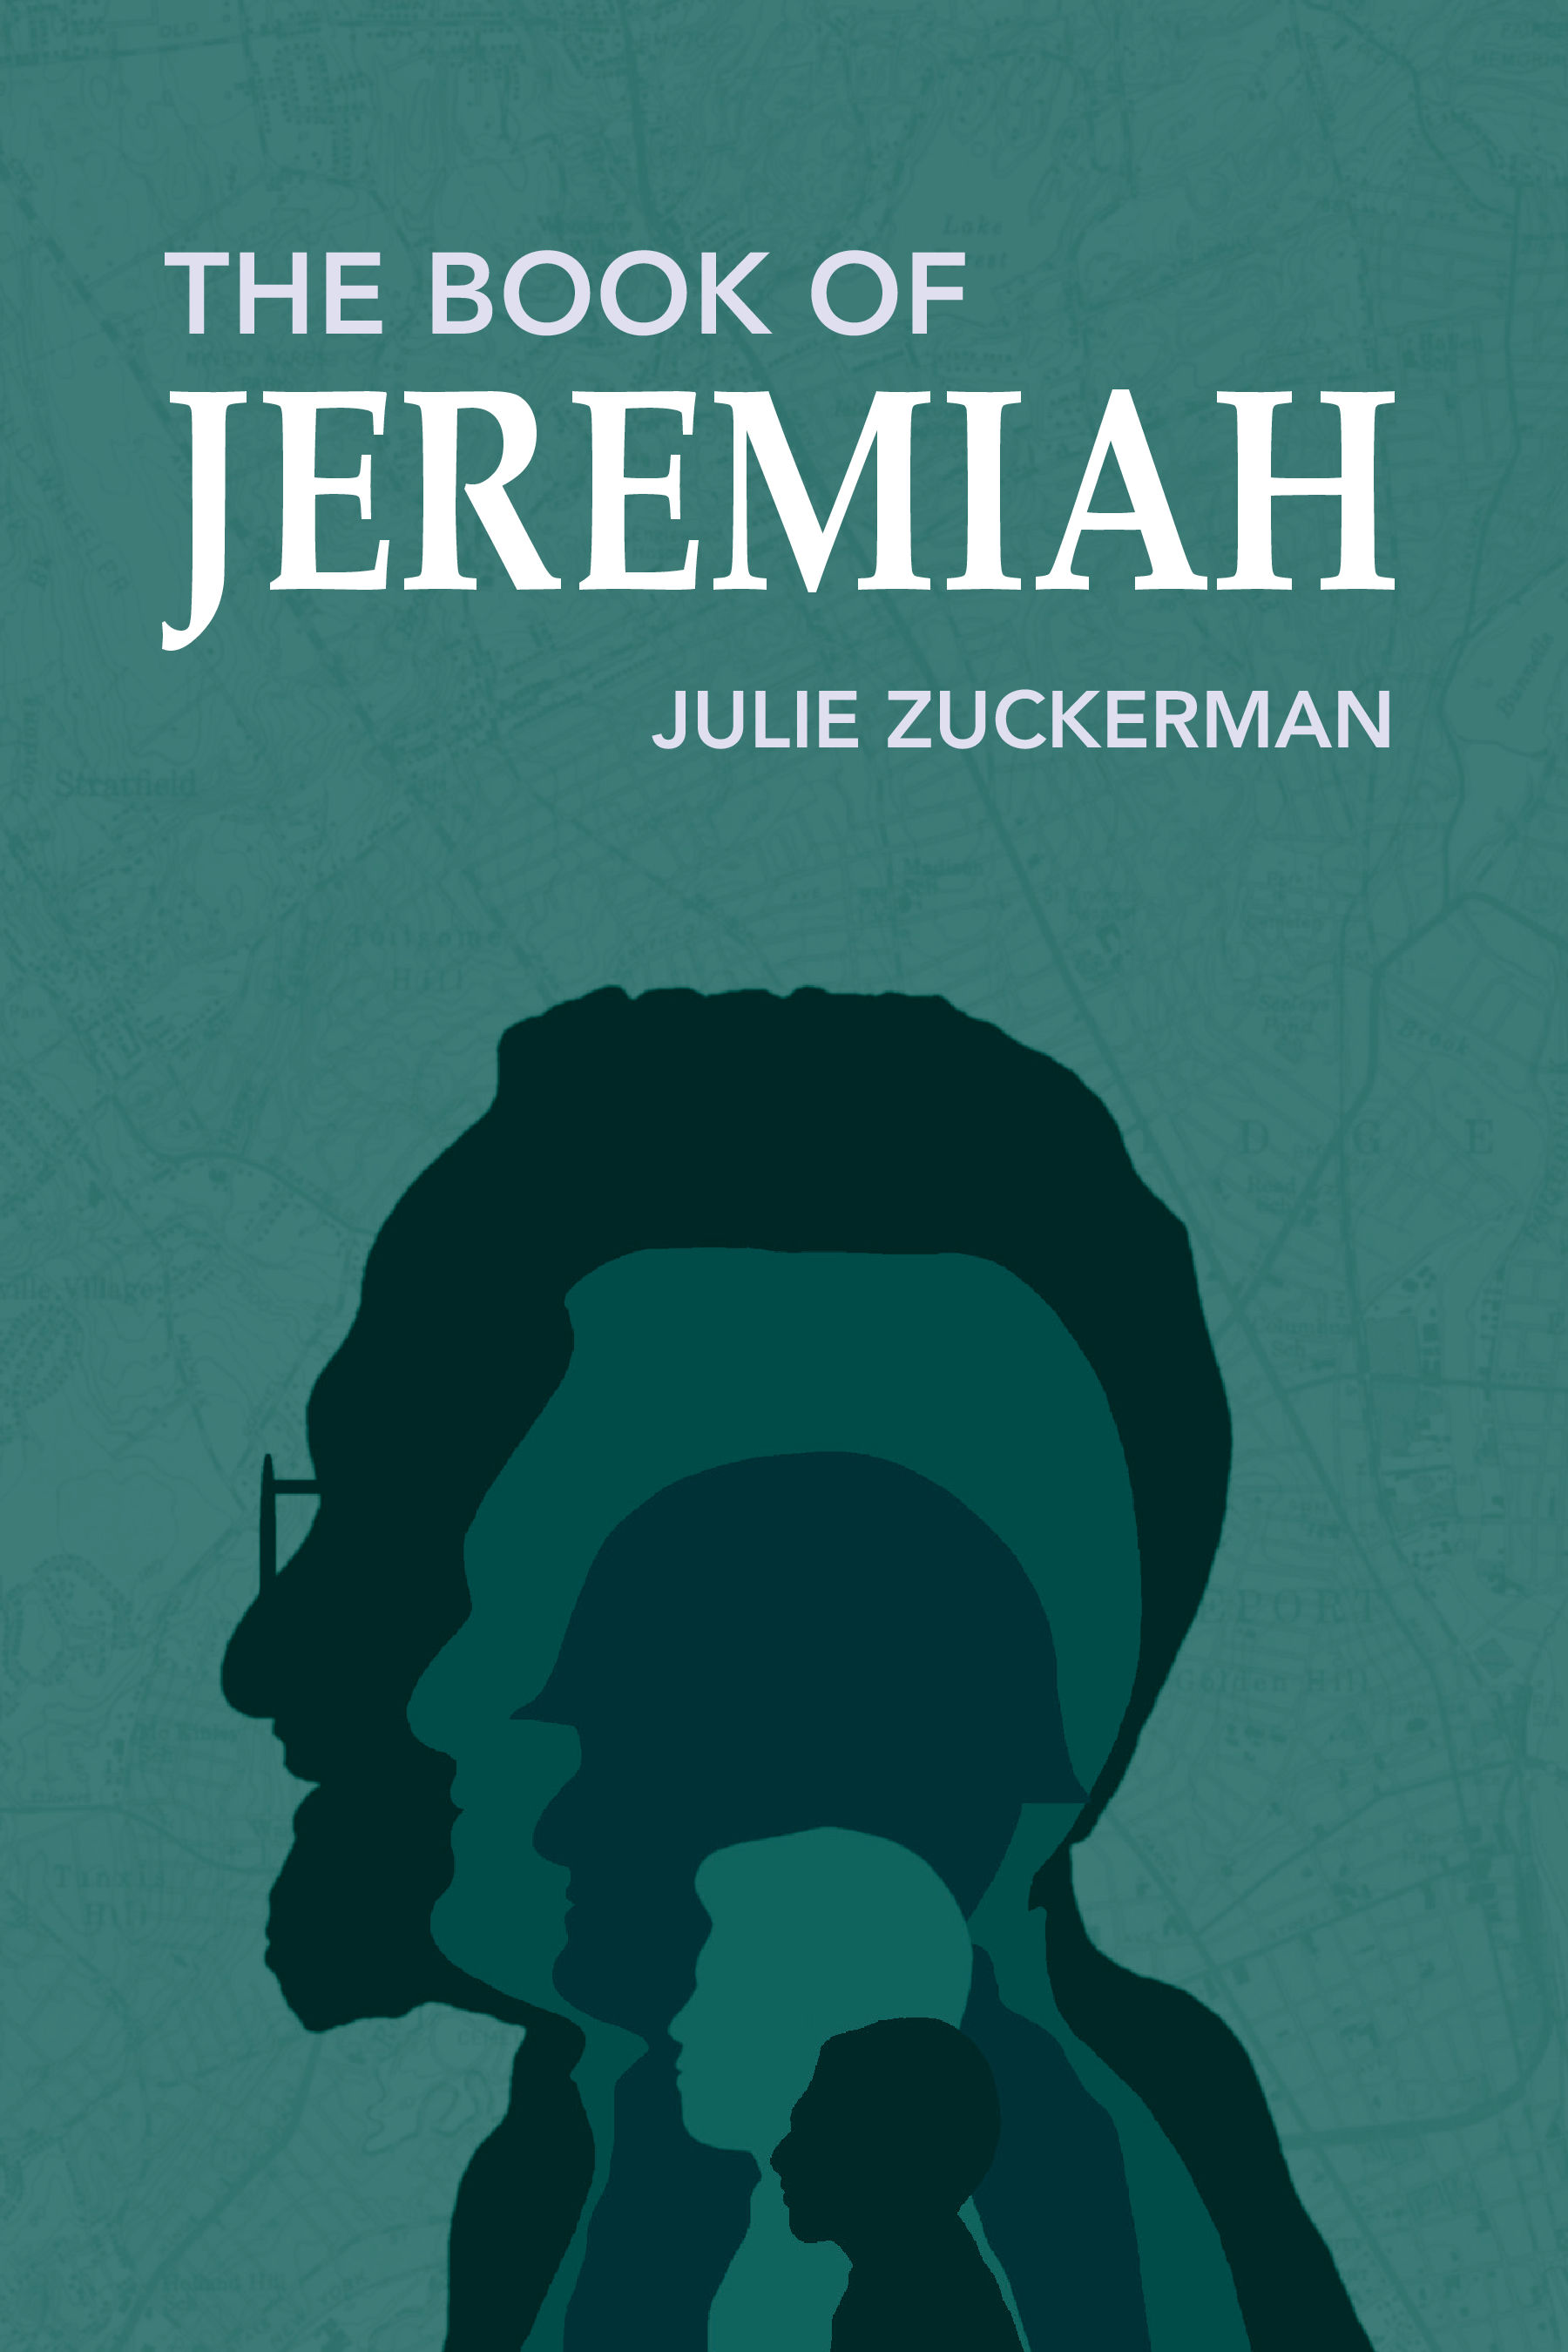 The Book of Jeremiah 2019 Press 53.jpg